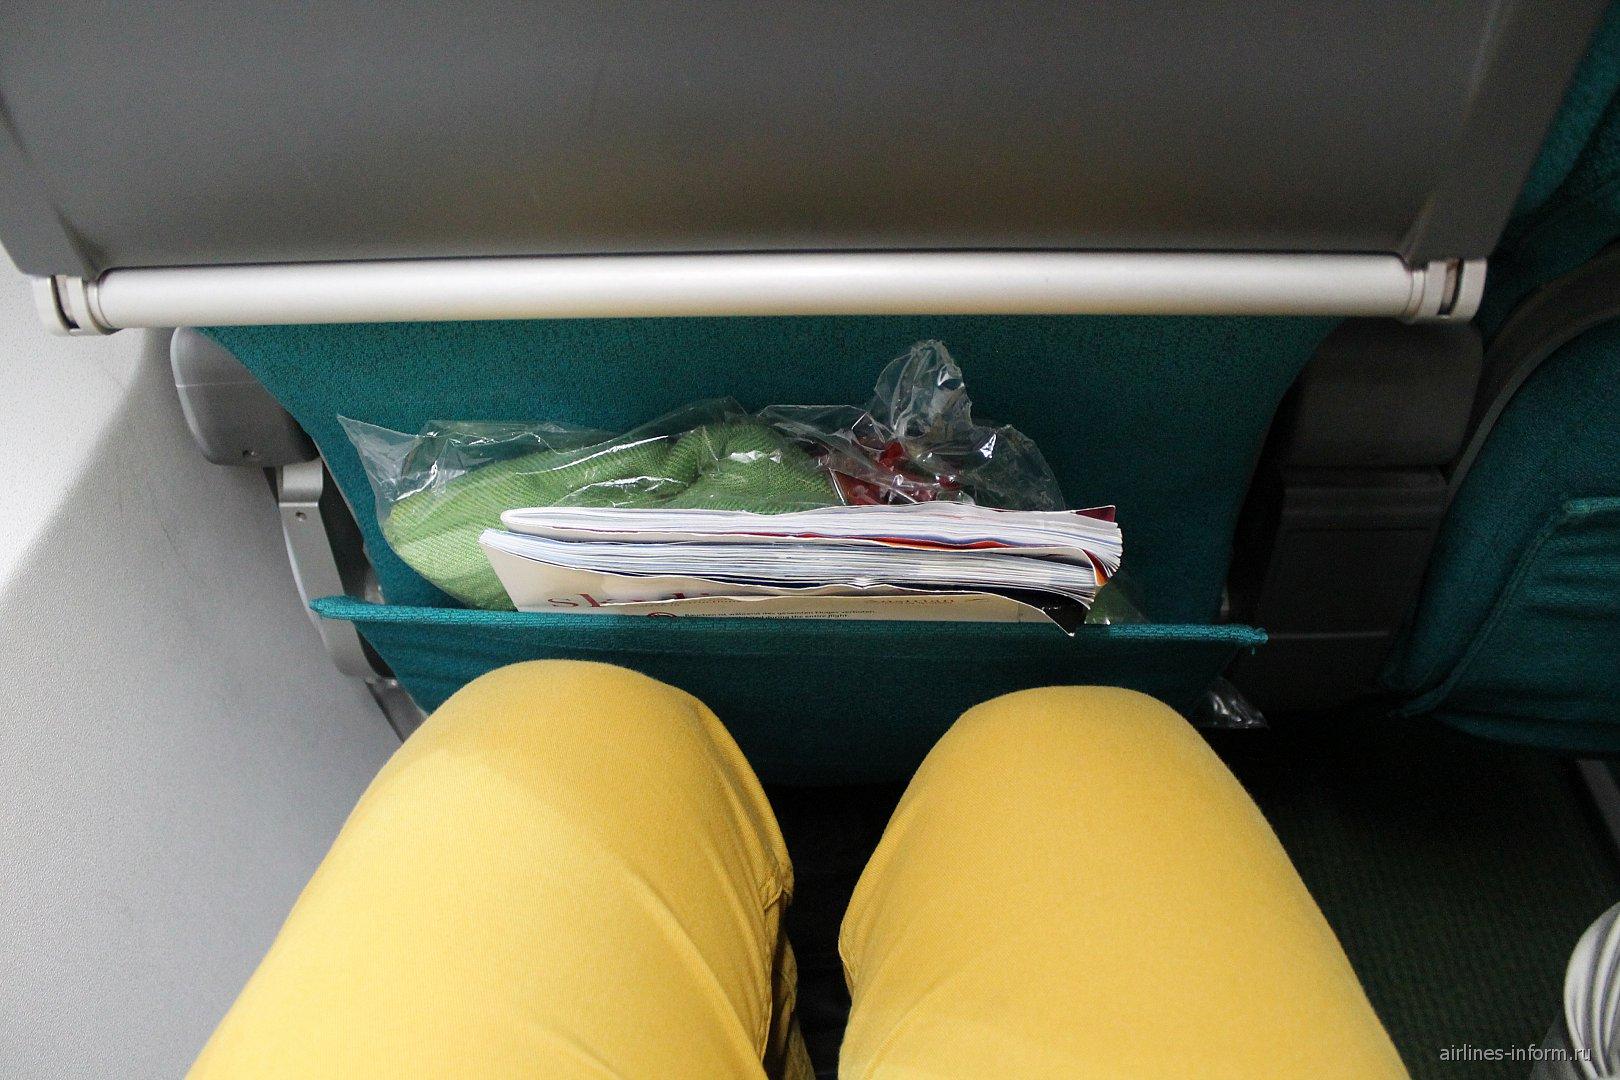 Кресла в самолете Фоккер-70 Австрийских авиалиний